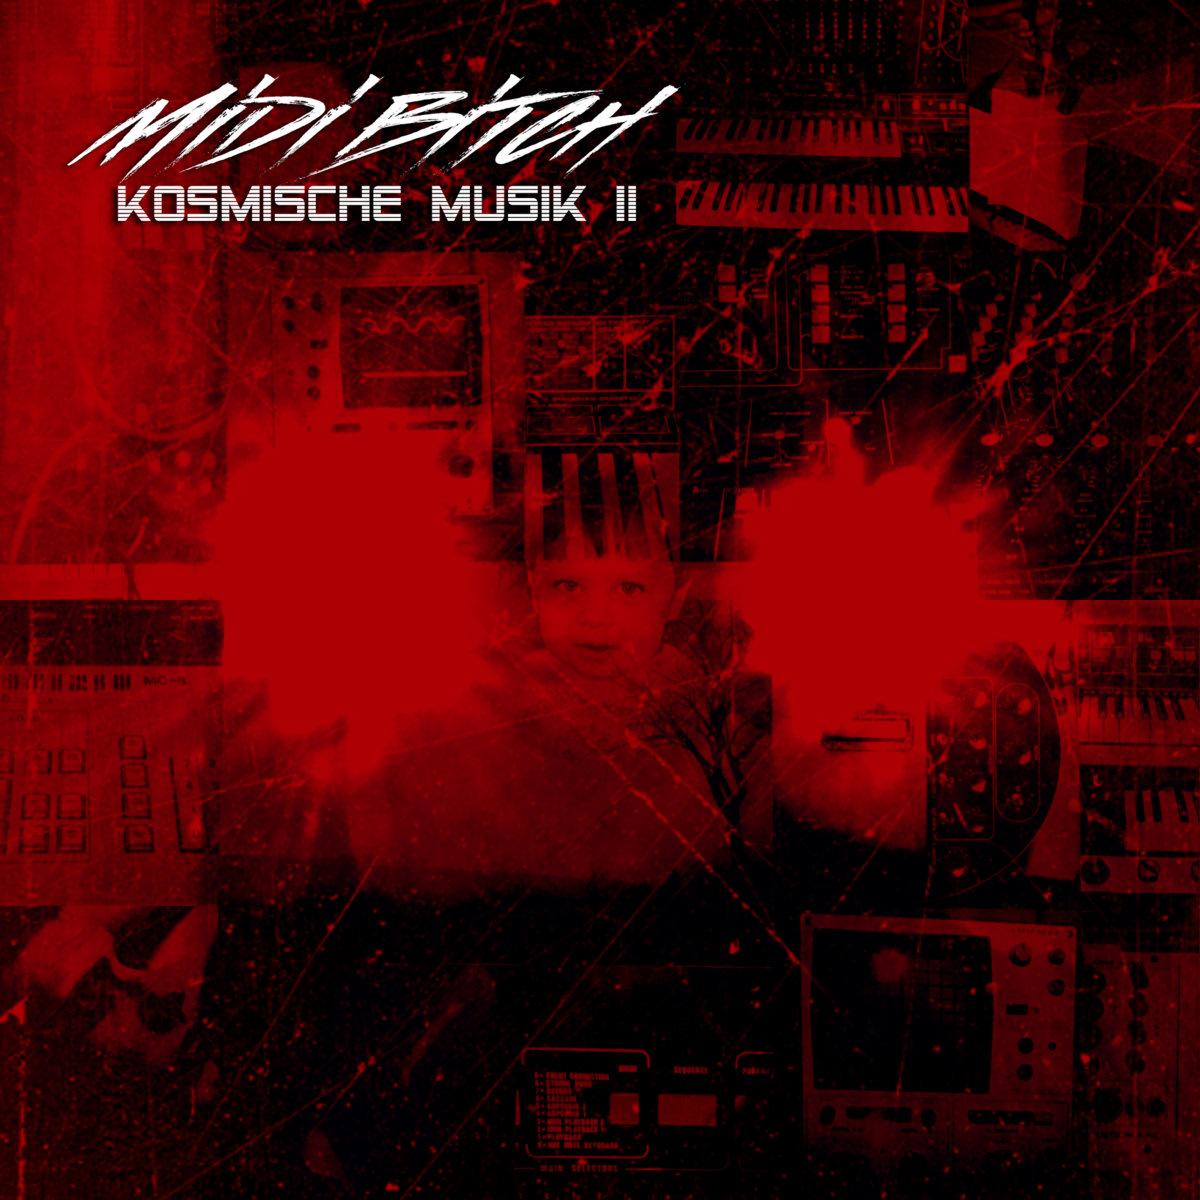 M!D! B!TCH - KOSMISCHE MUSIK 2